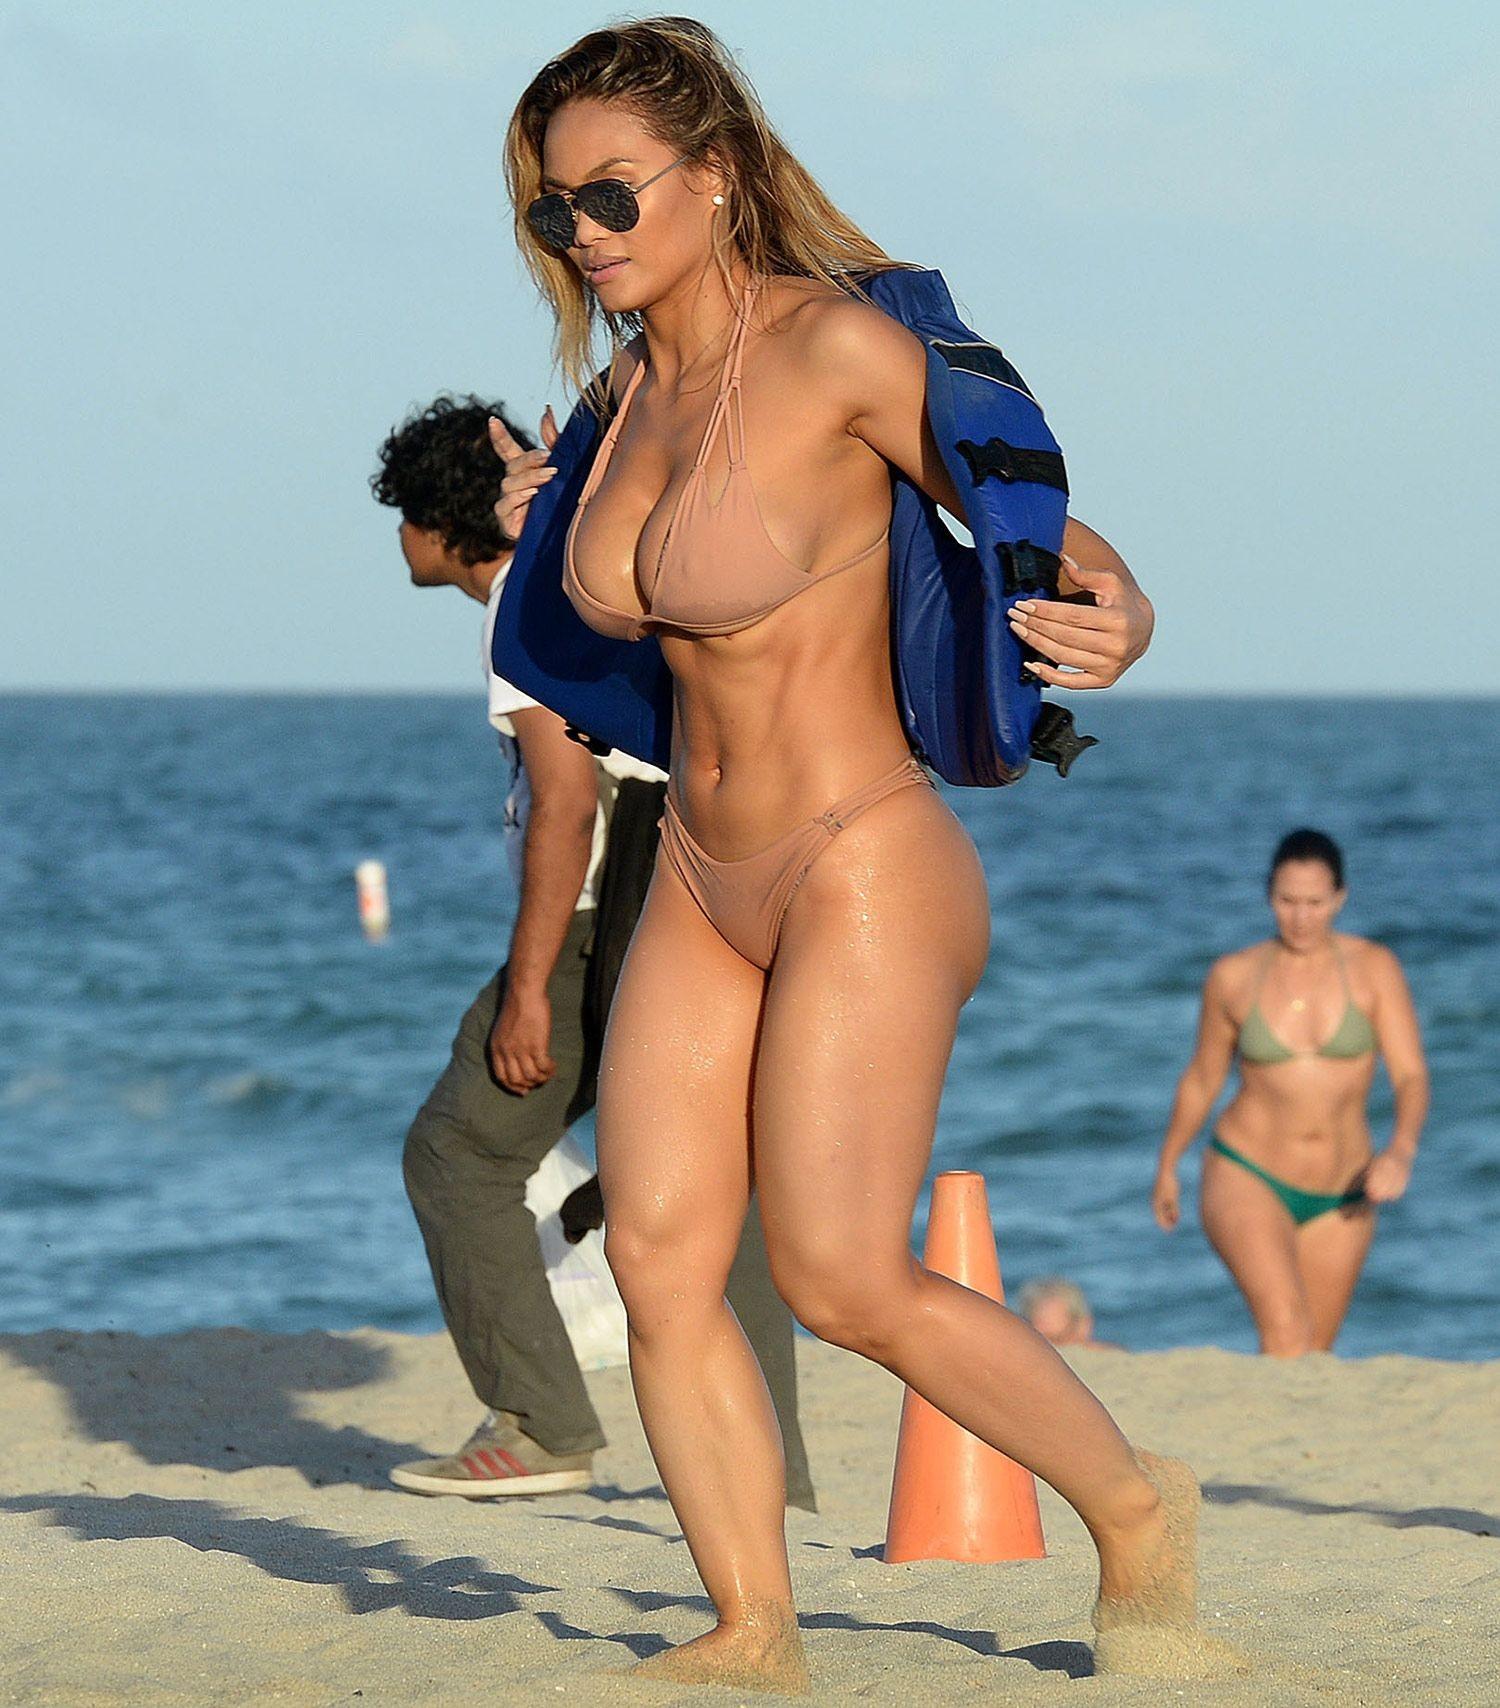 Mercedes maxwell sex from marfa girl on scandalplanetcom - 1 9